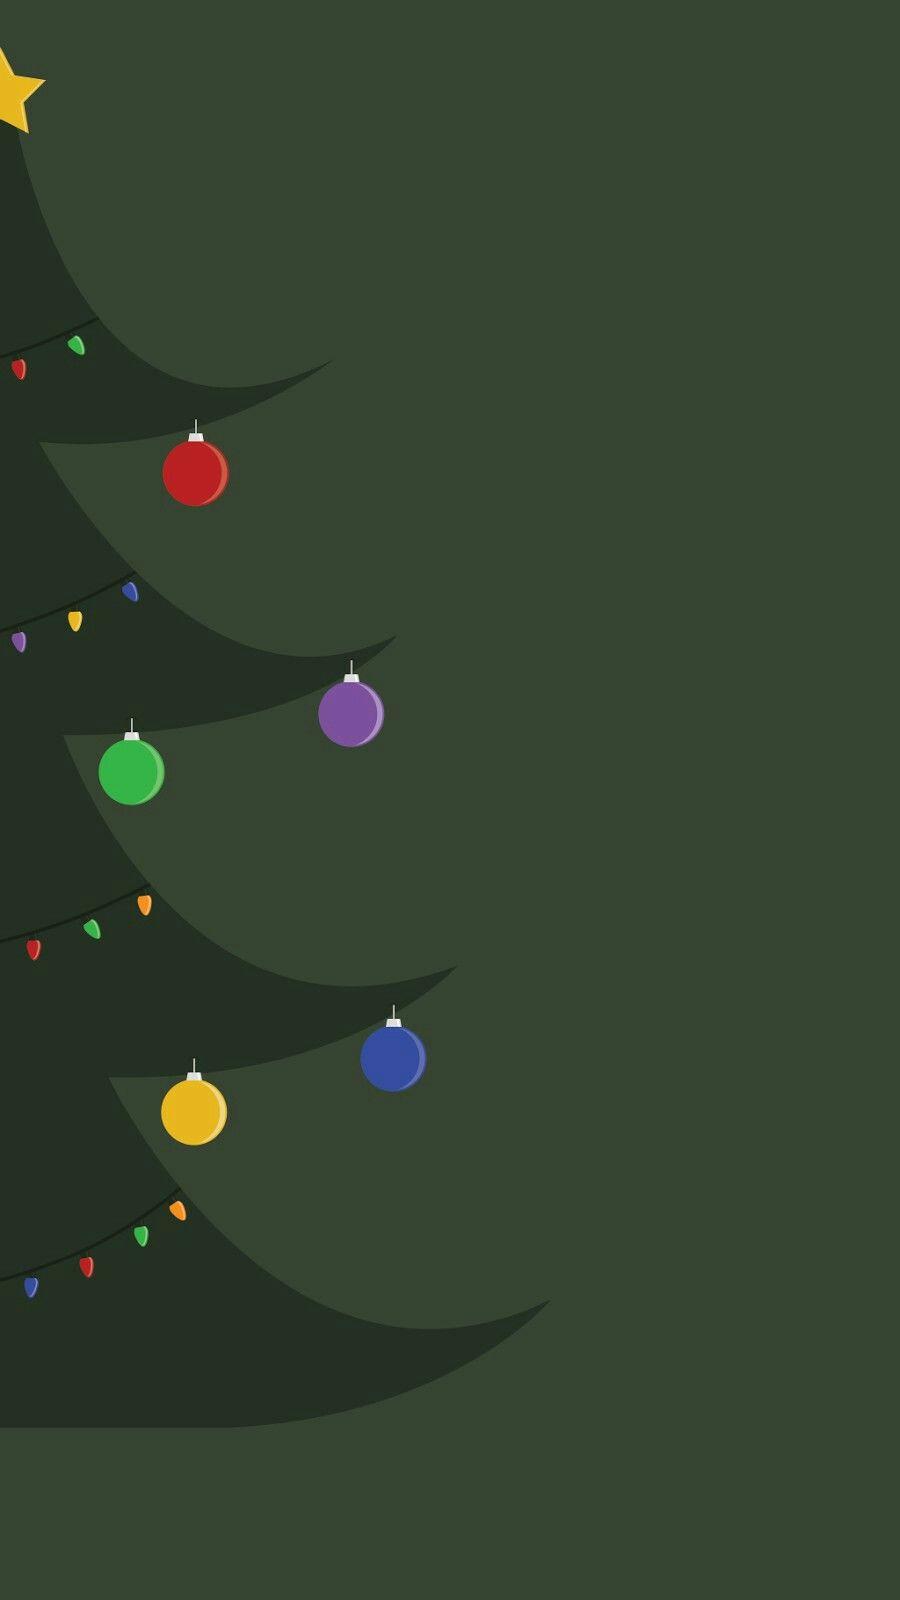 Lovenote5 Christmas Wallpaper Backgrounds Christmas Wallpaper Tree Wallpaper Iphone